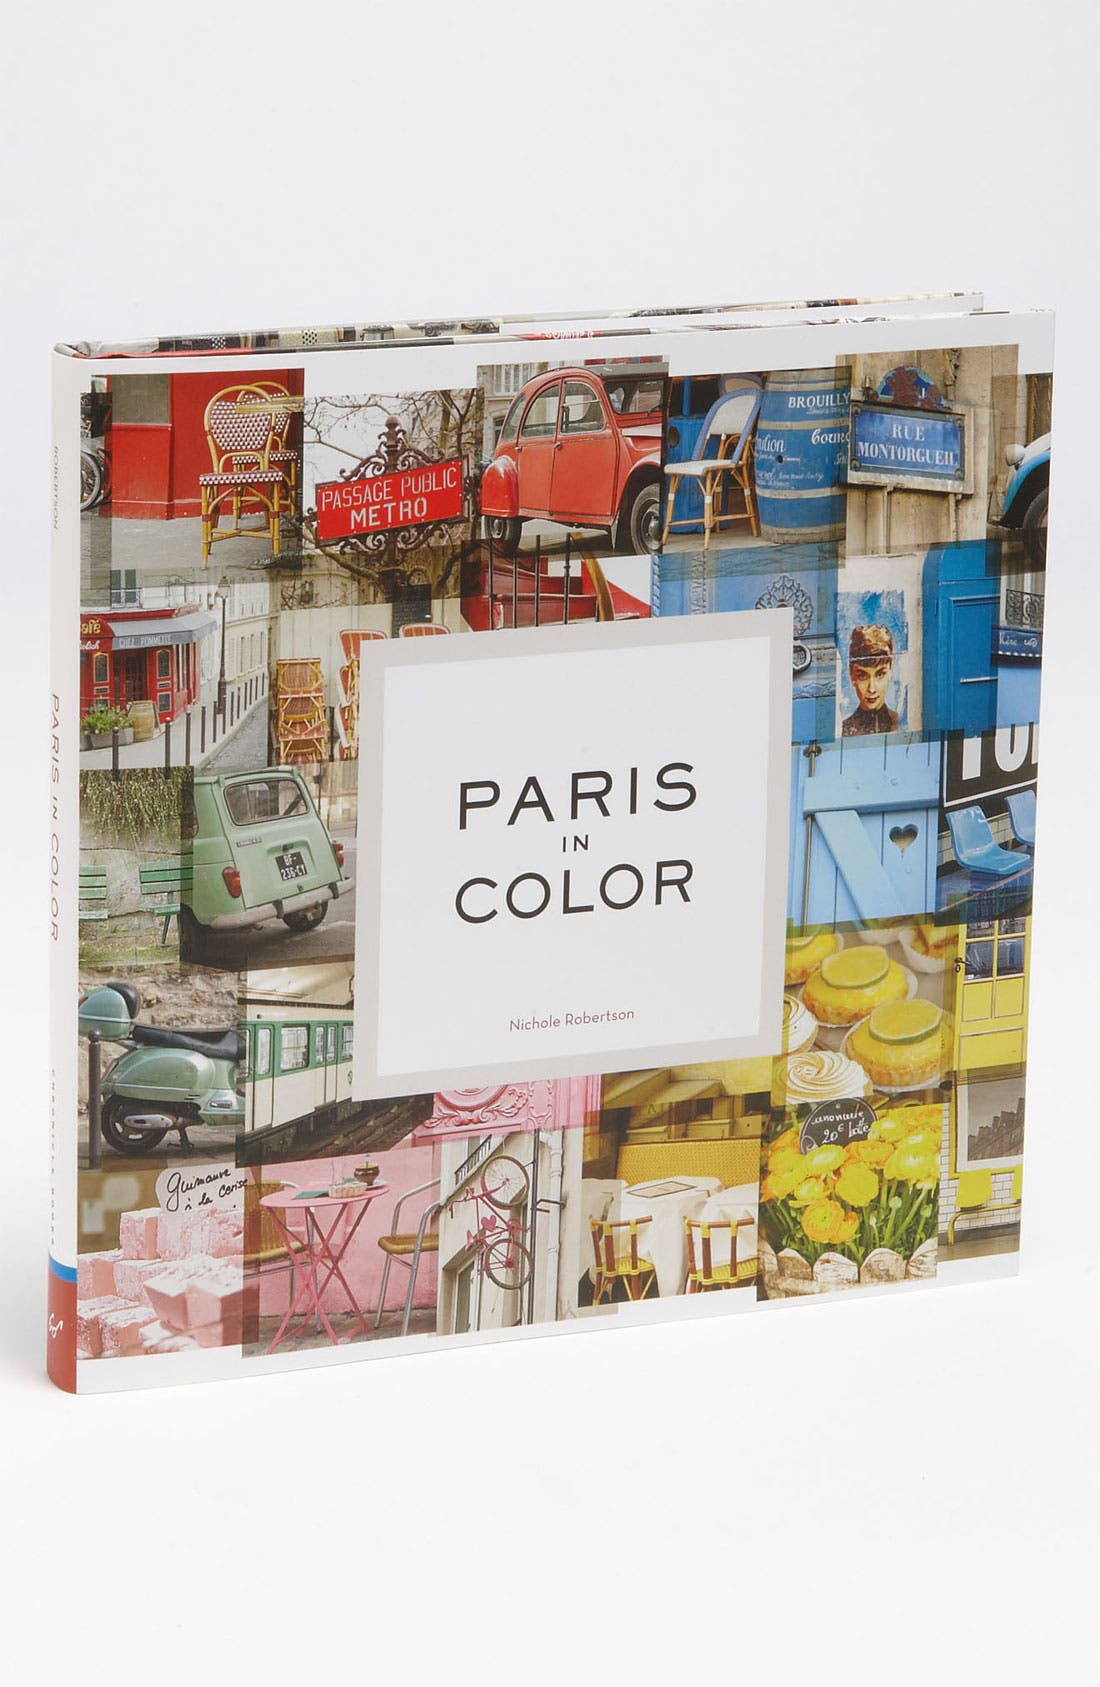 Alternate Image 1 Selected - Nichole Robertson 'Paris in Color' Book